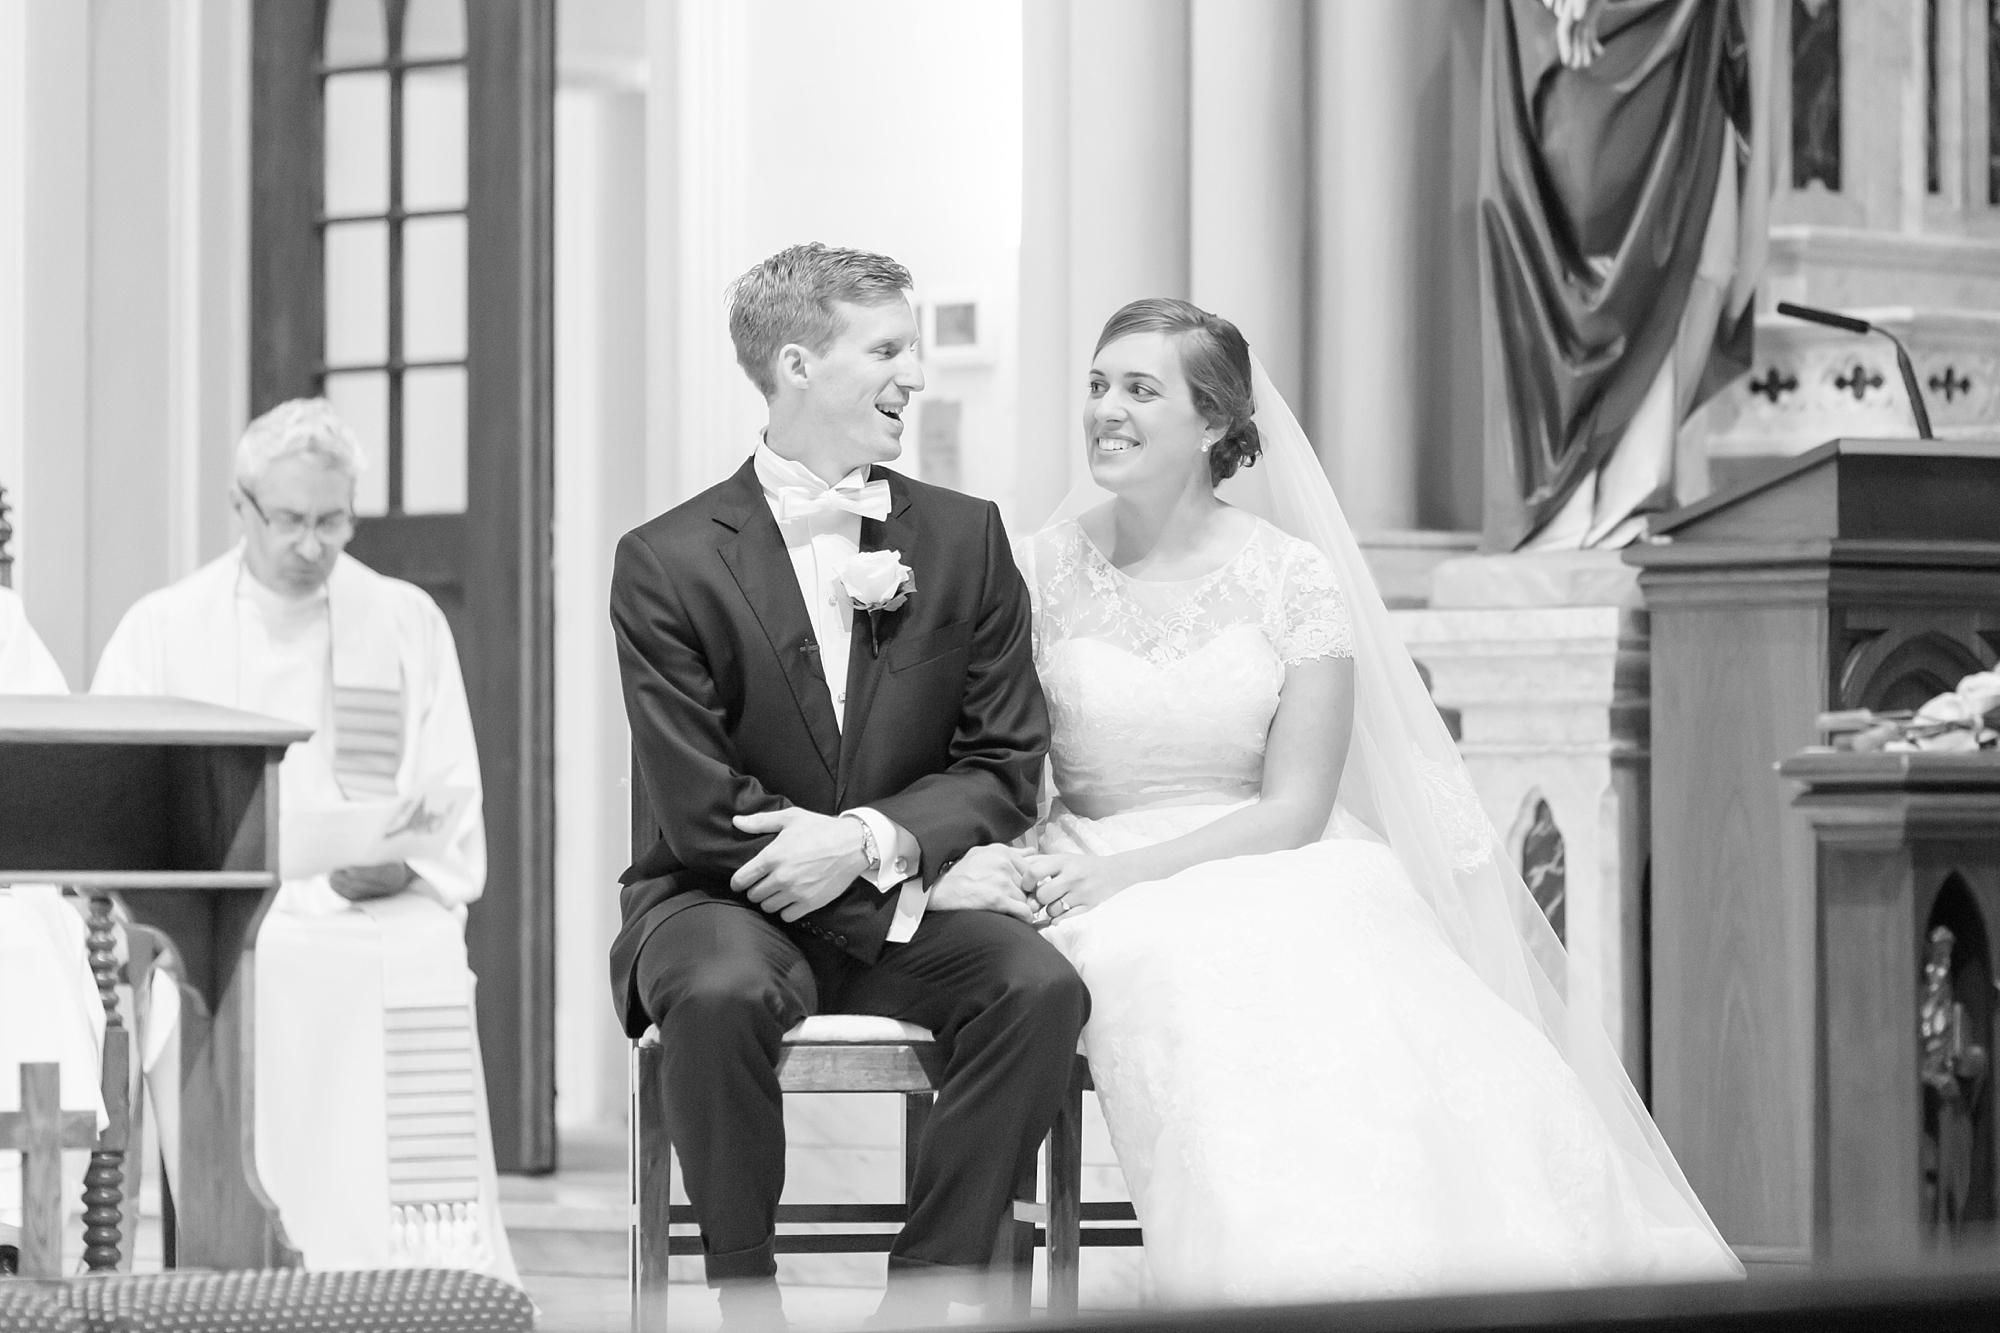 Somerville 2-Ceremony-72_anna grace photography sherwood forest annapolis maryland wedding photographer photo.jpg